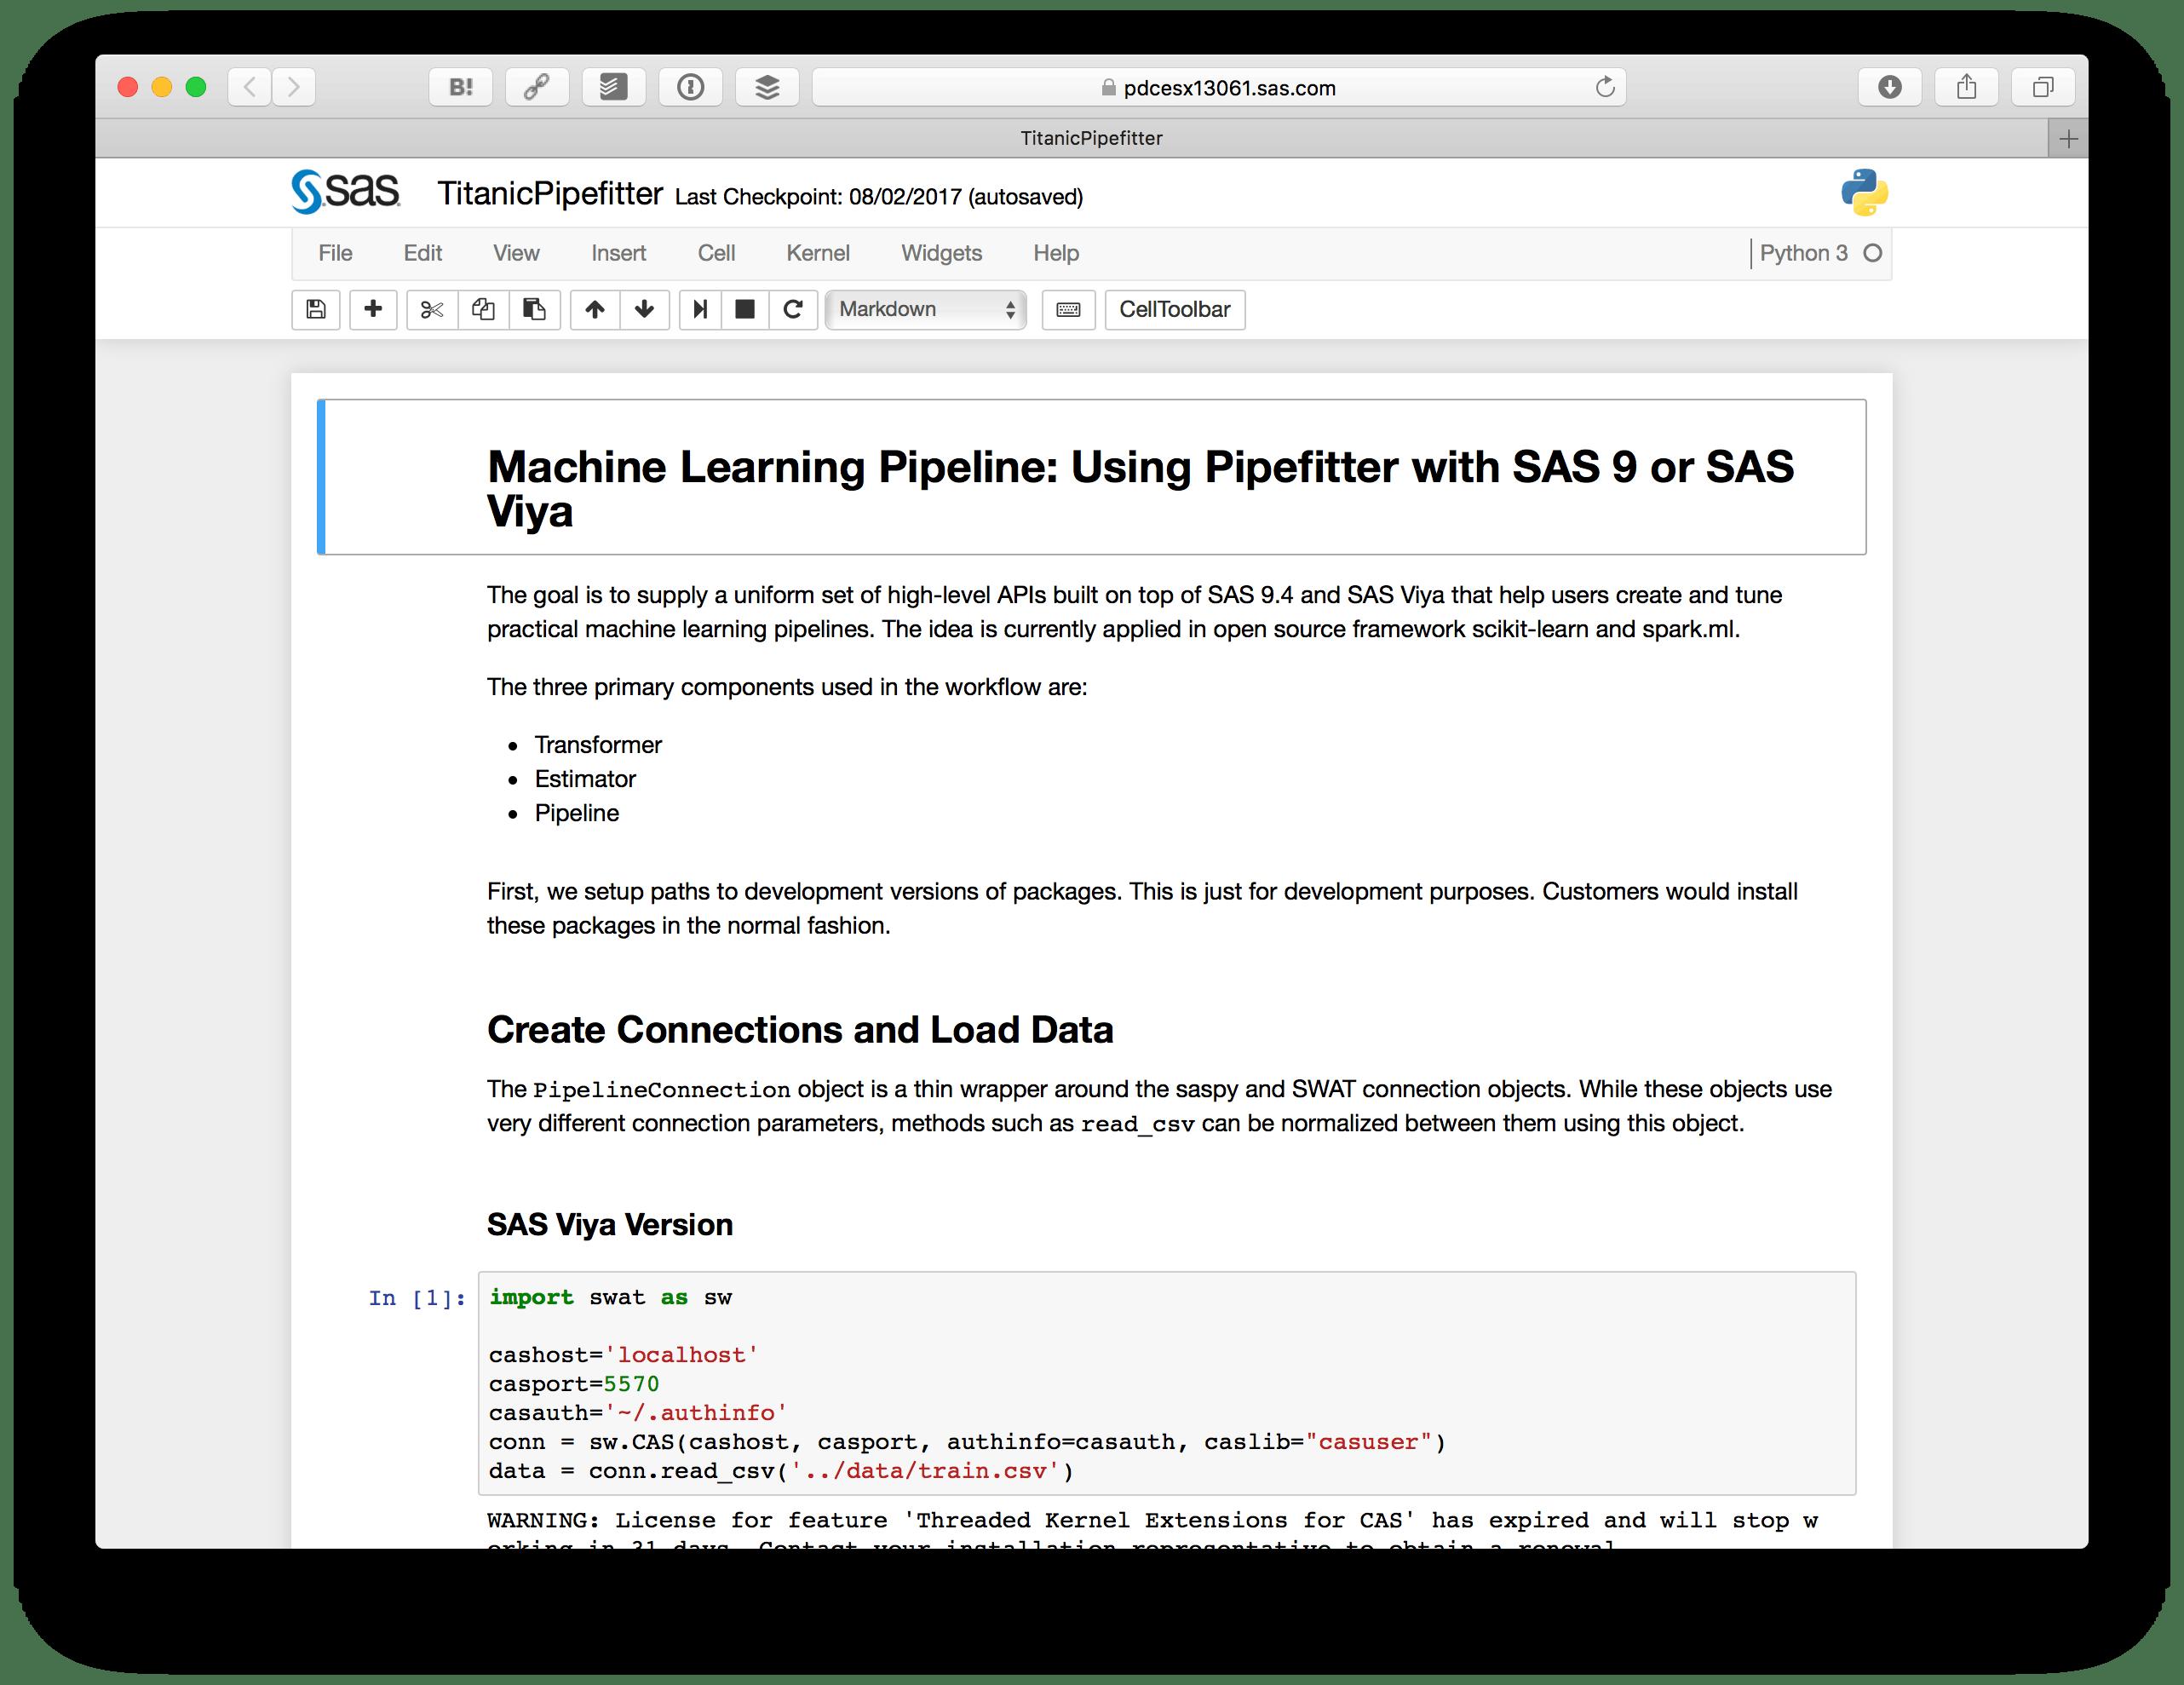 Screenshot_ 2018-05-24 15.40.03.png